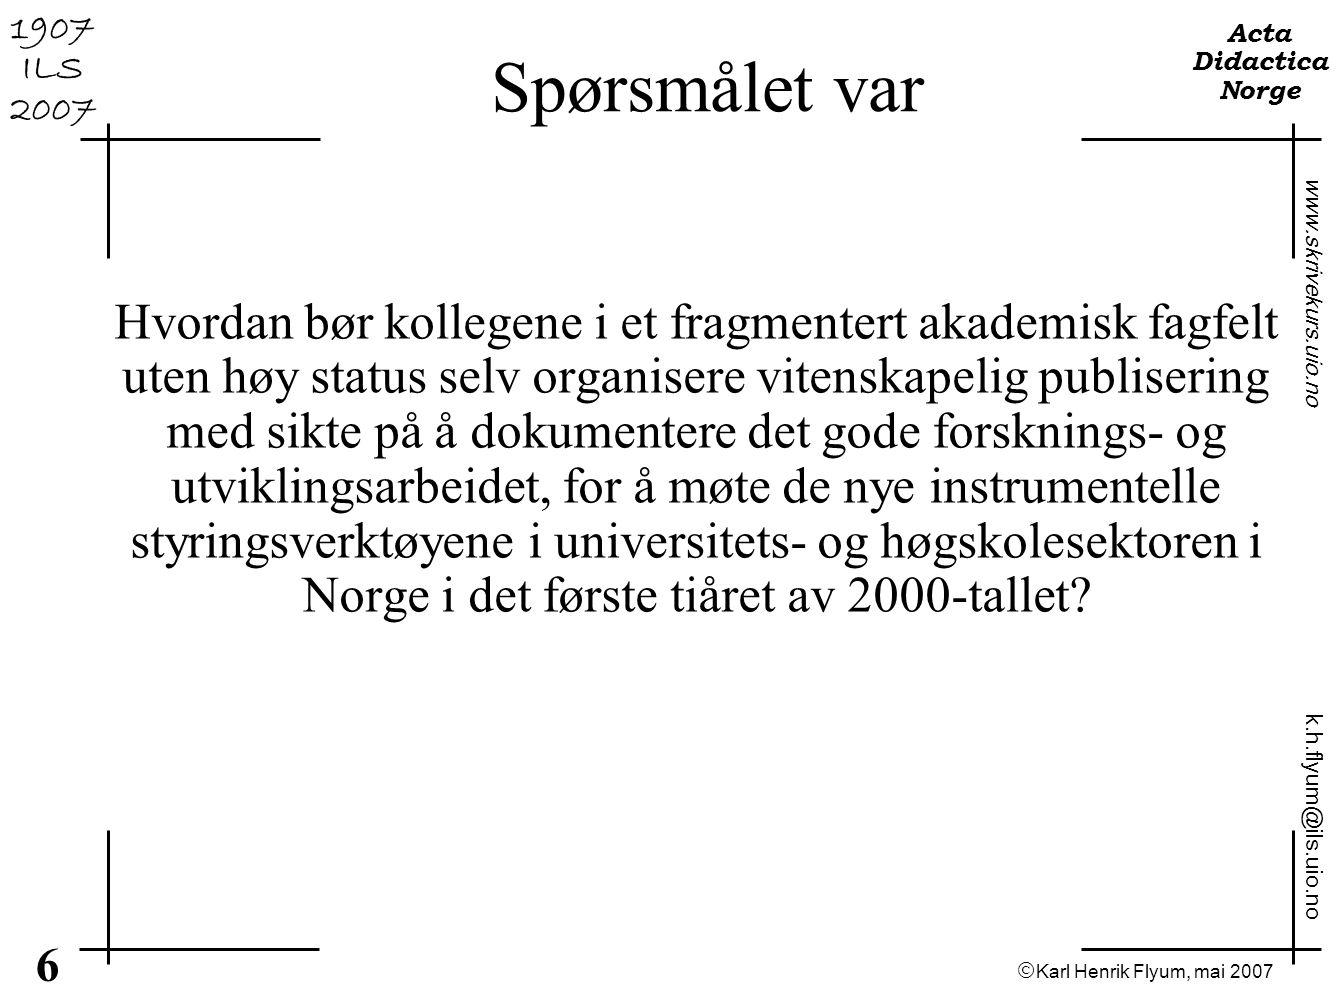  Karl Henrik Flyum, mai 2007 6 www.skrivekurs.uio.no k.h.flyum@ils.uio.no Acta Didactica Norge 1907 ILS 2007 Spørsmålet var Hvordan bør kollegene i e